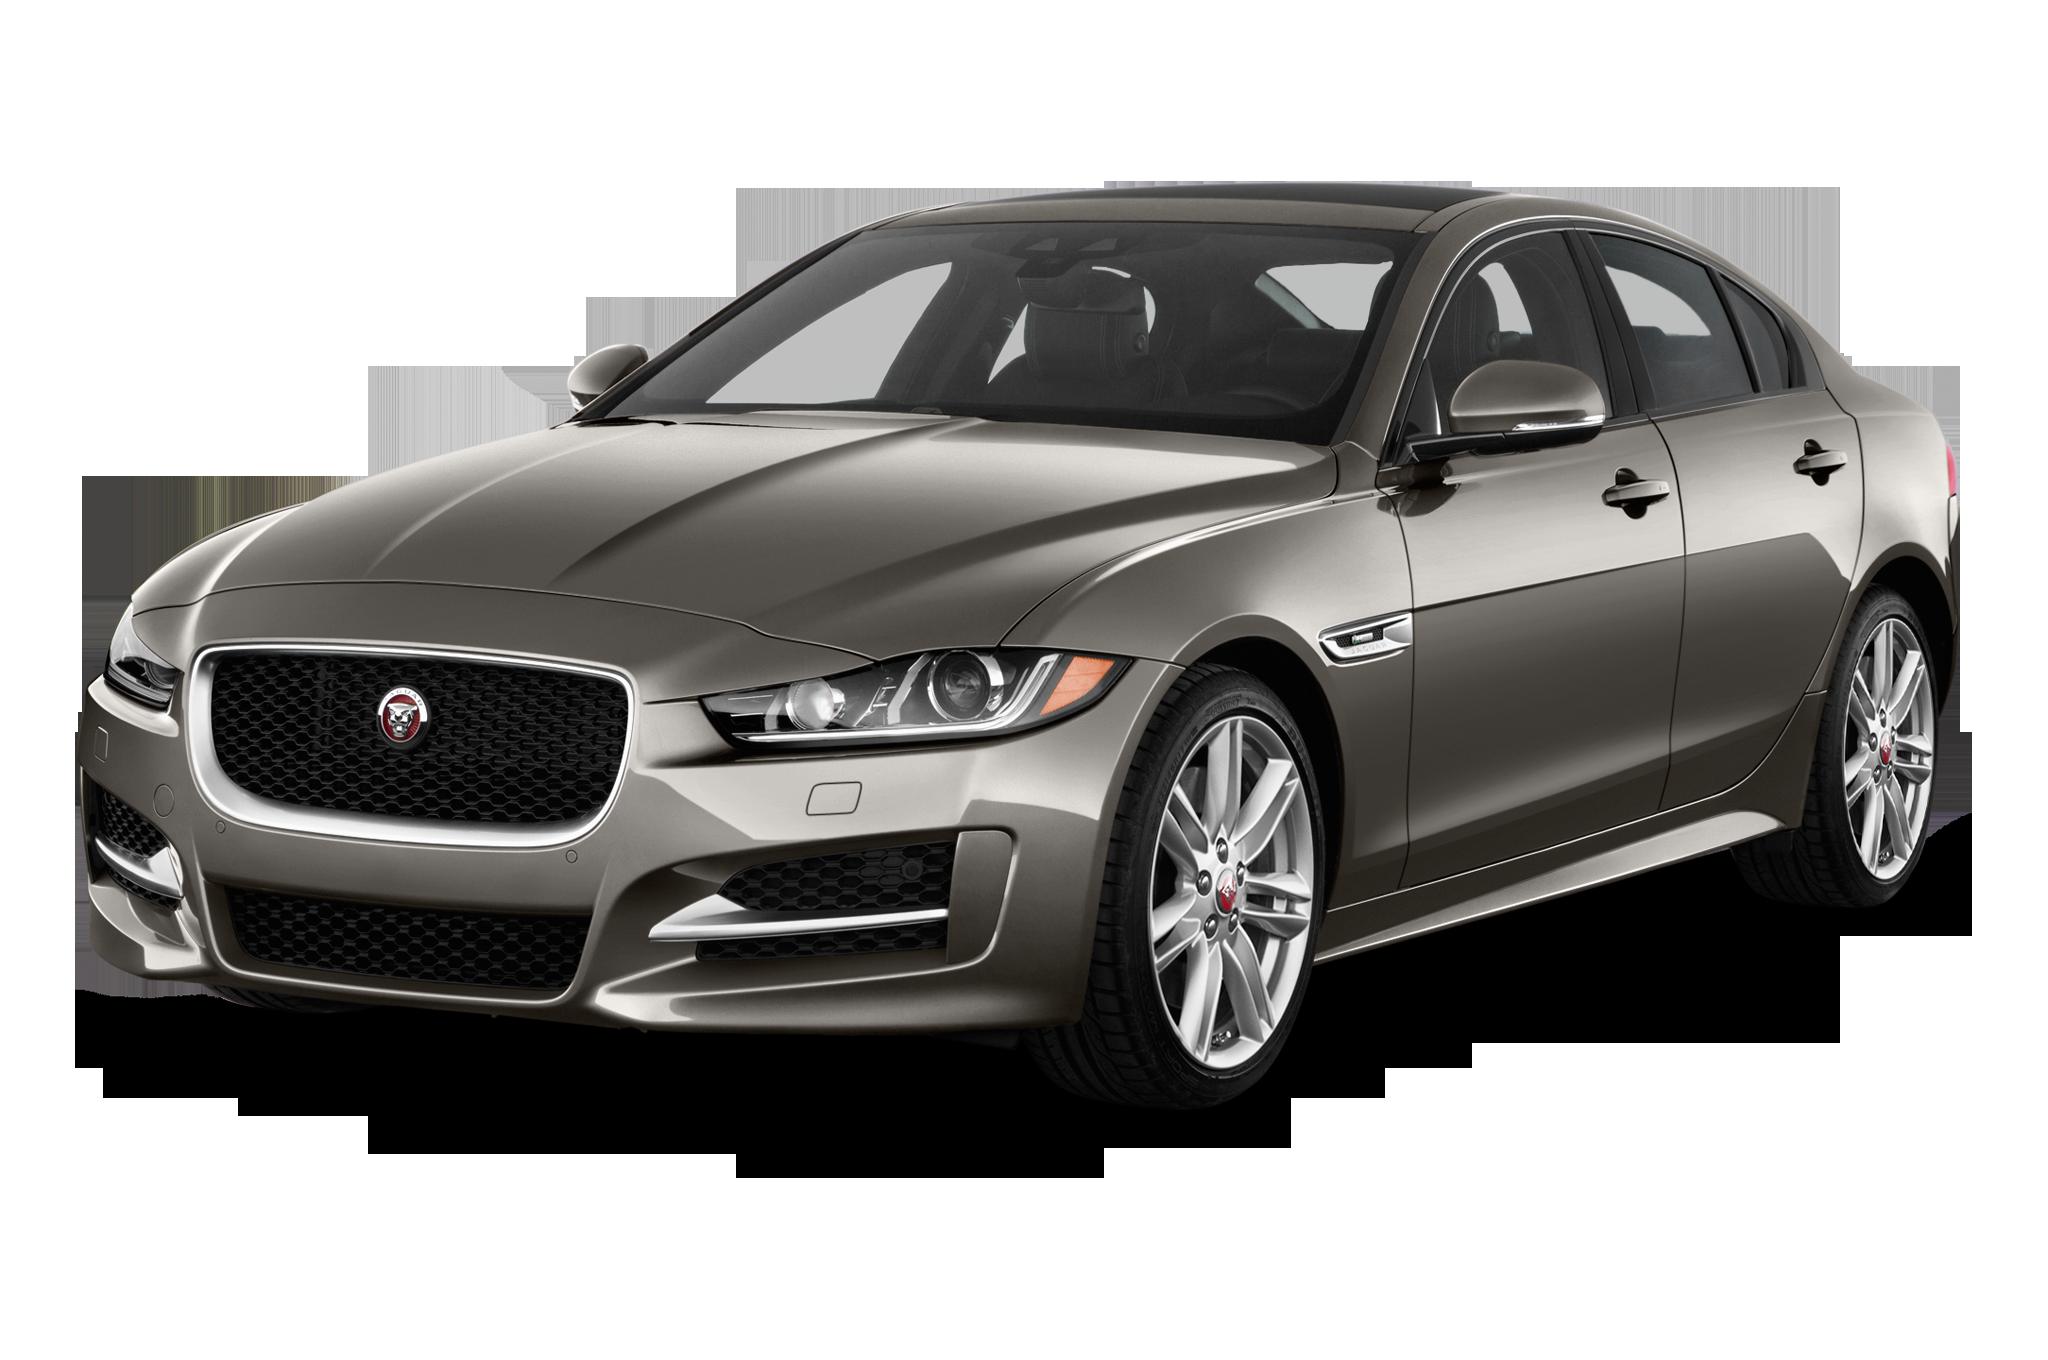 jaguar xj car price united prices cars